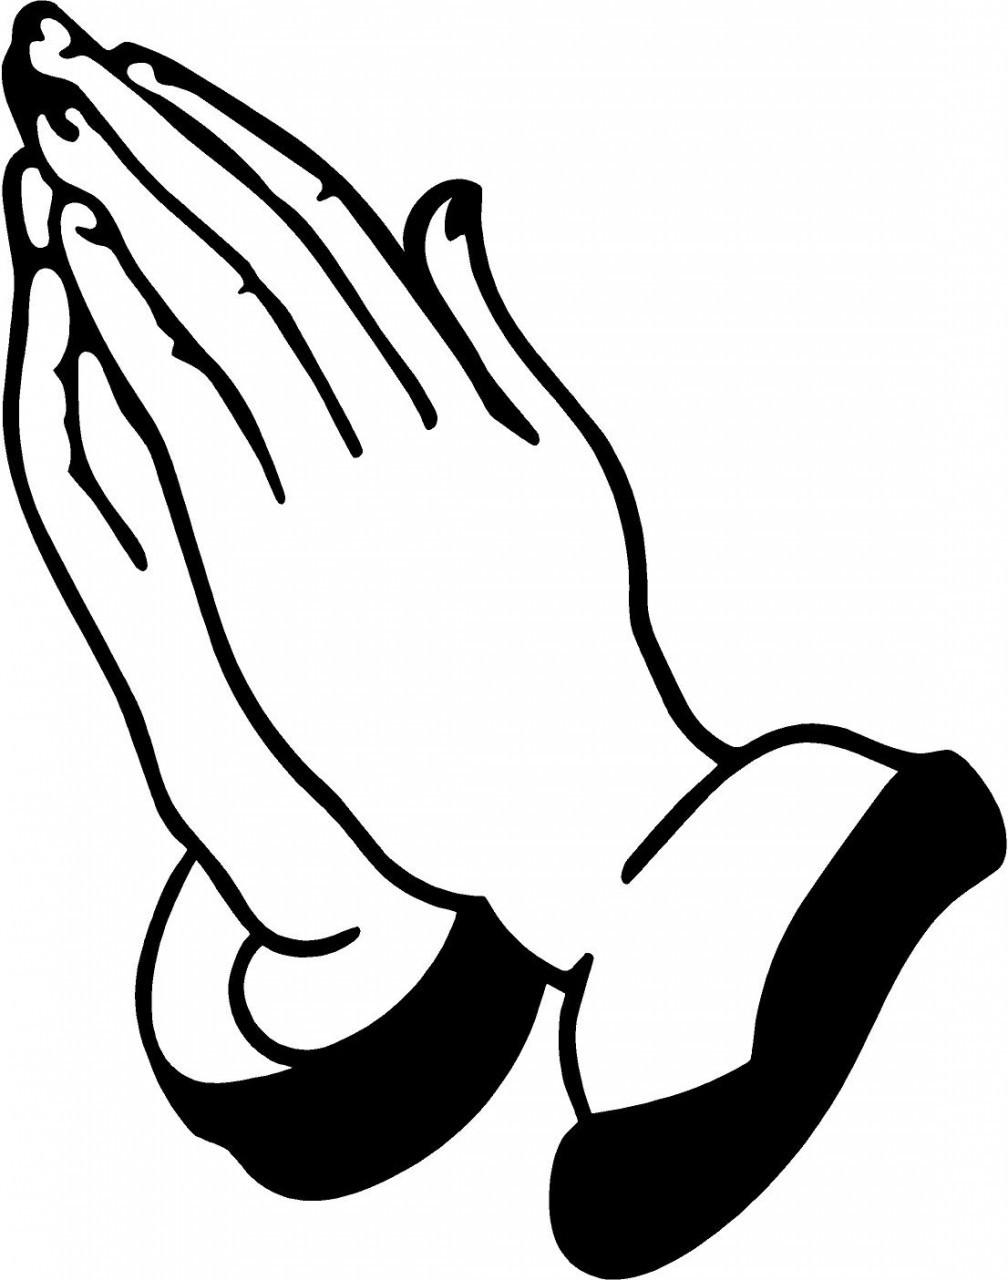 clipart on prayer - photo #34